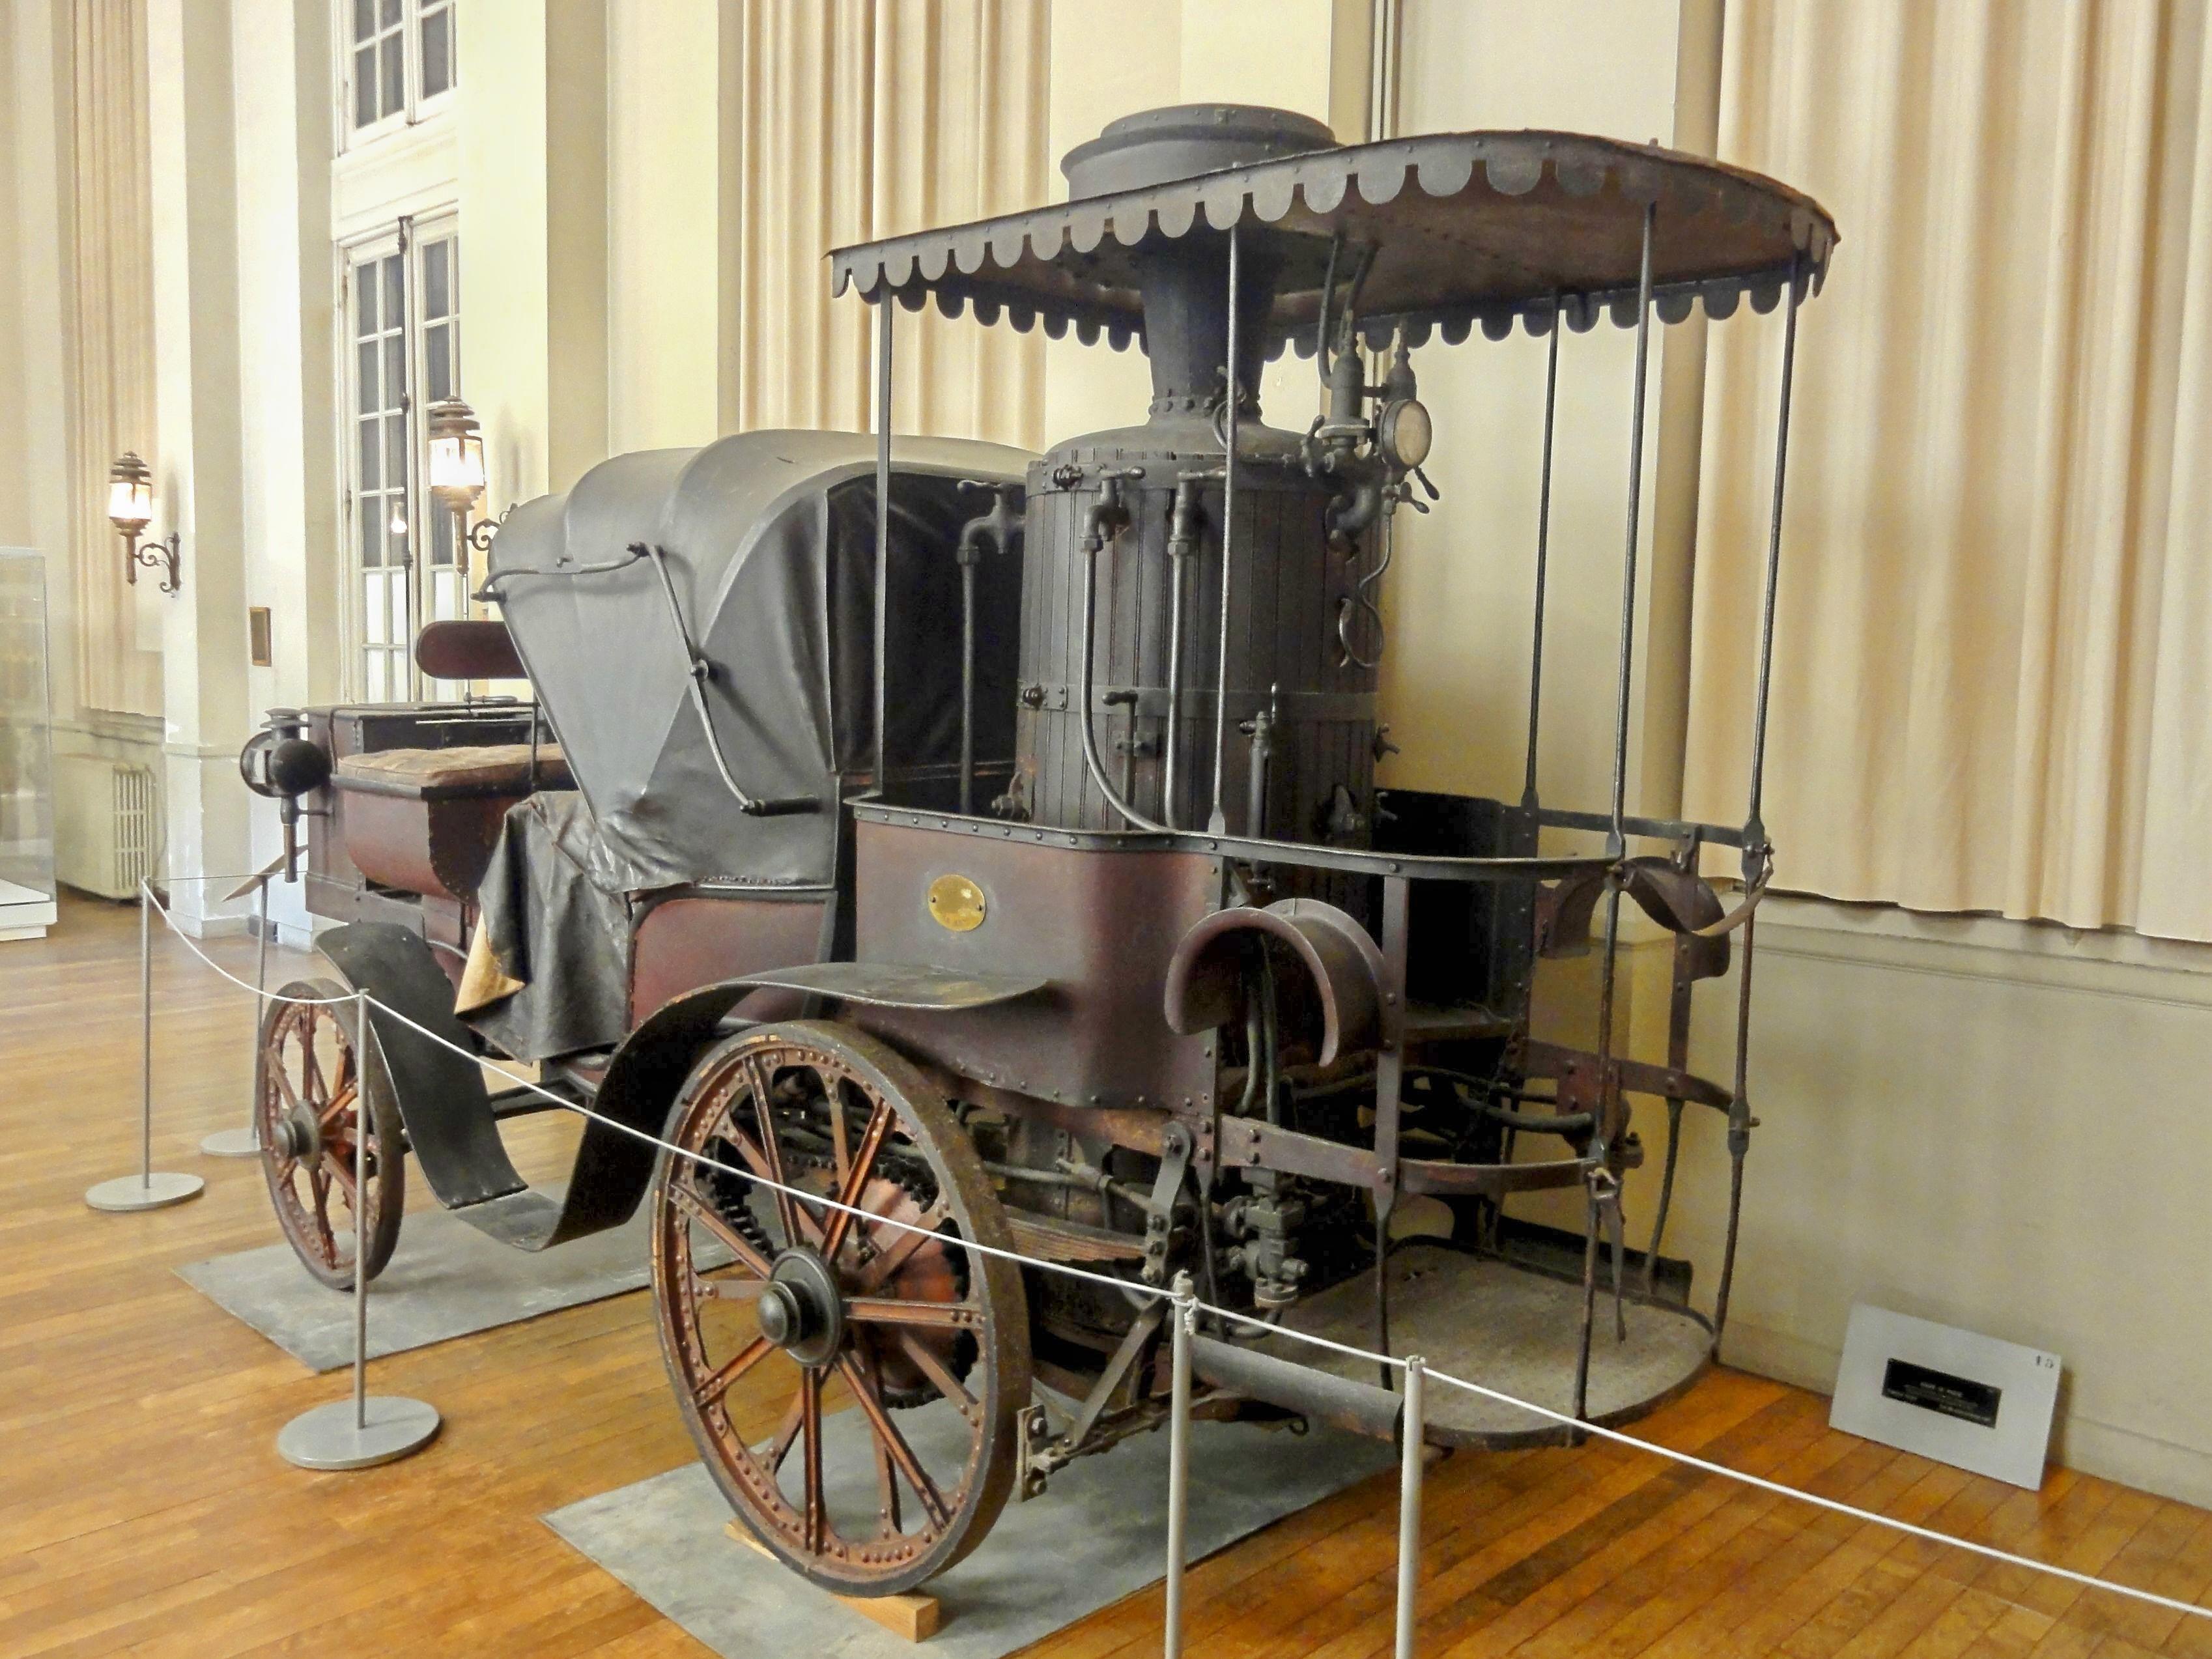 file compi gne 60 mus e de la voiture la mancelle 1878 wikimedia commons. Black Bedroom Furniture Sets. Home Design Ideas